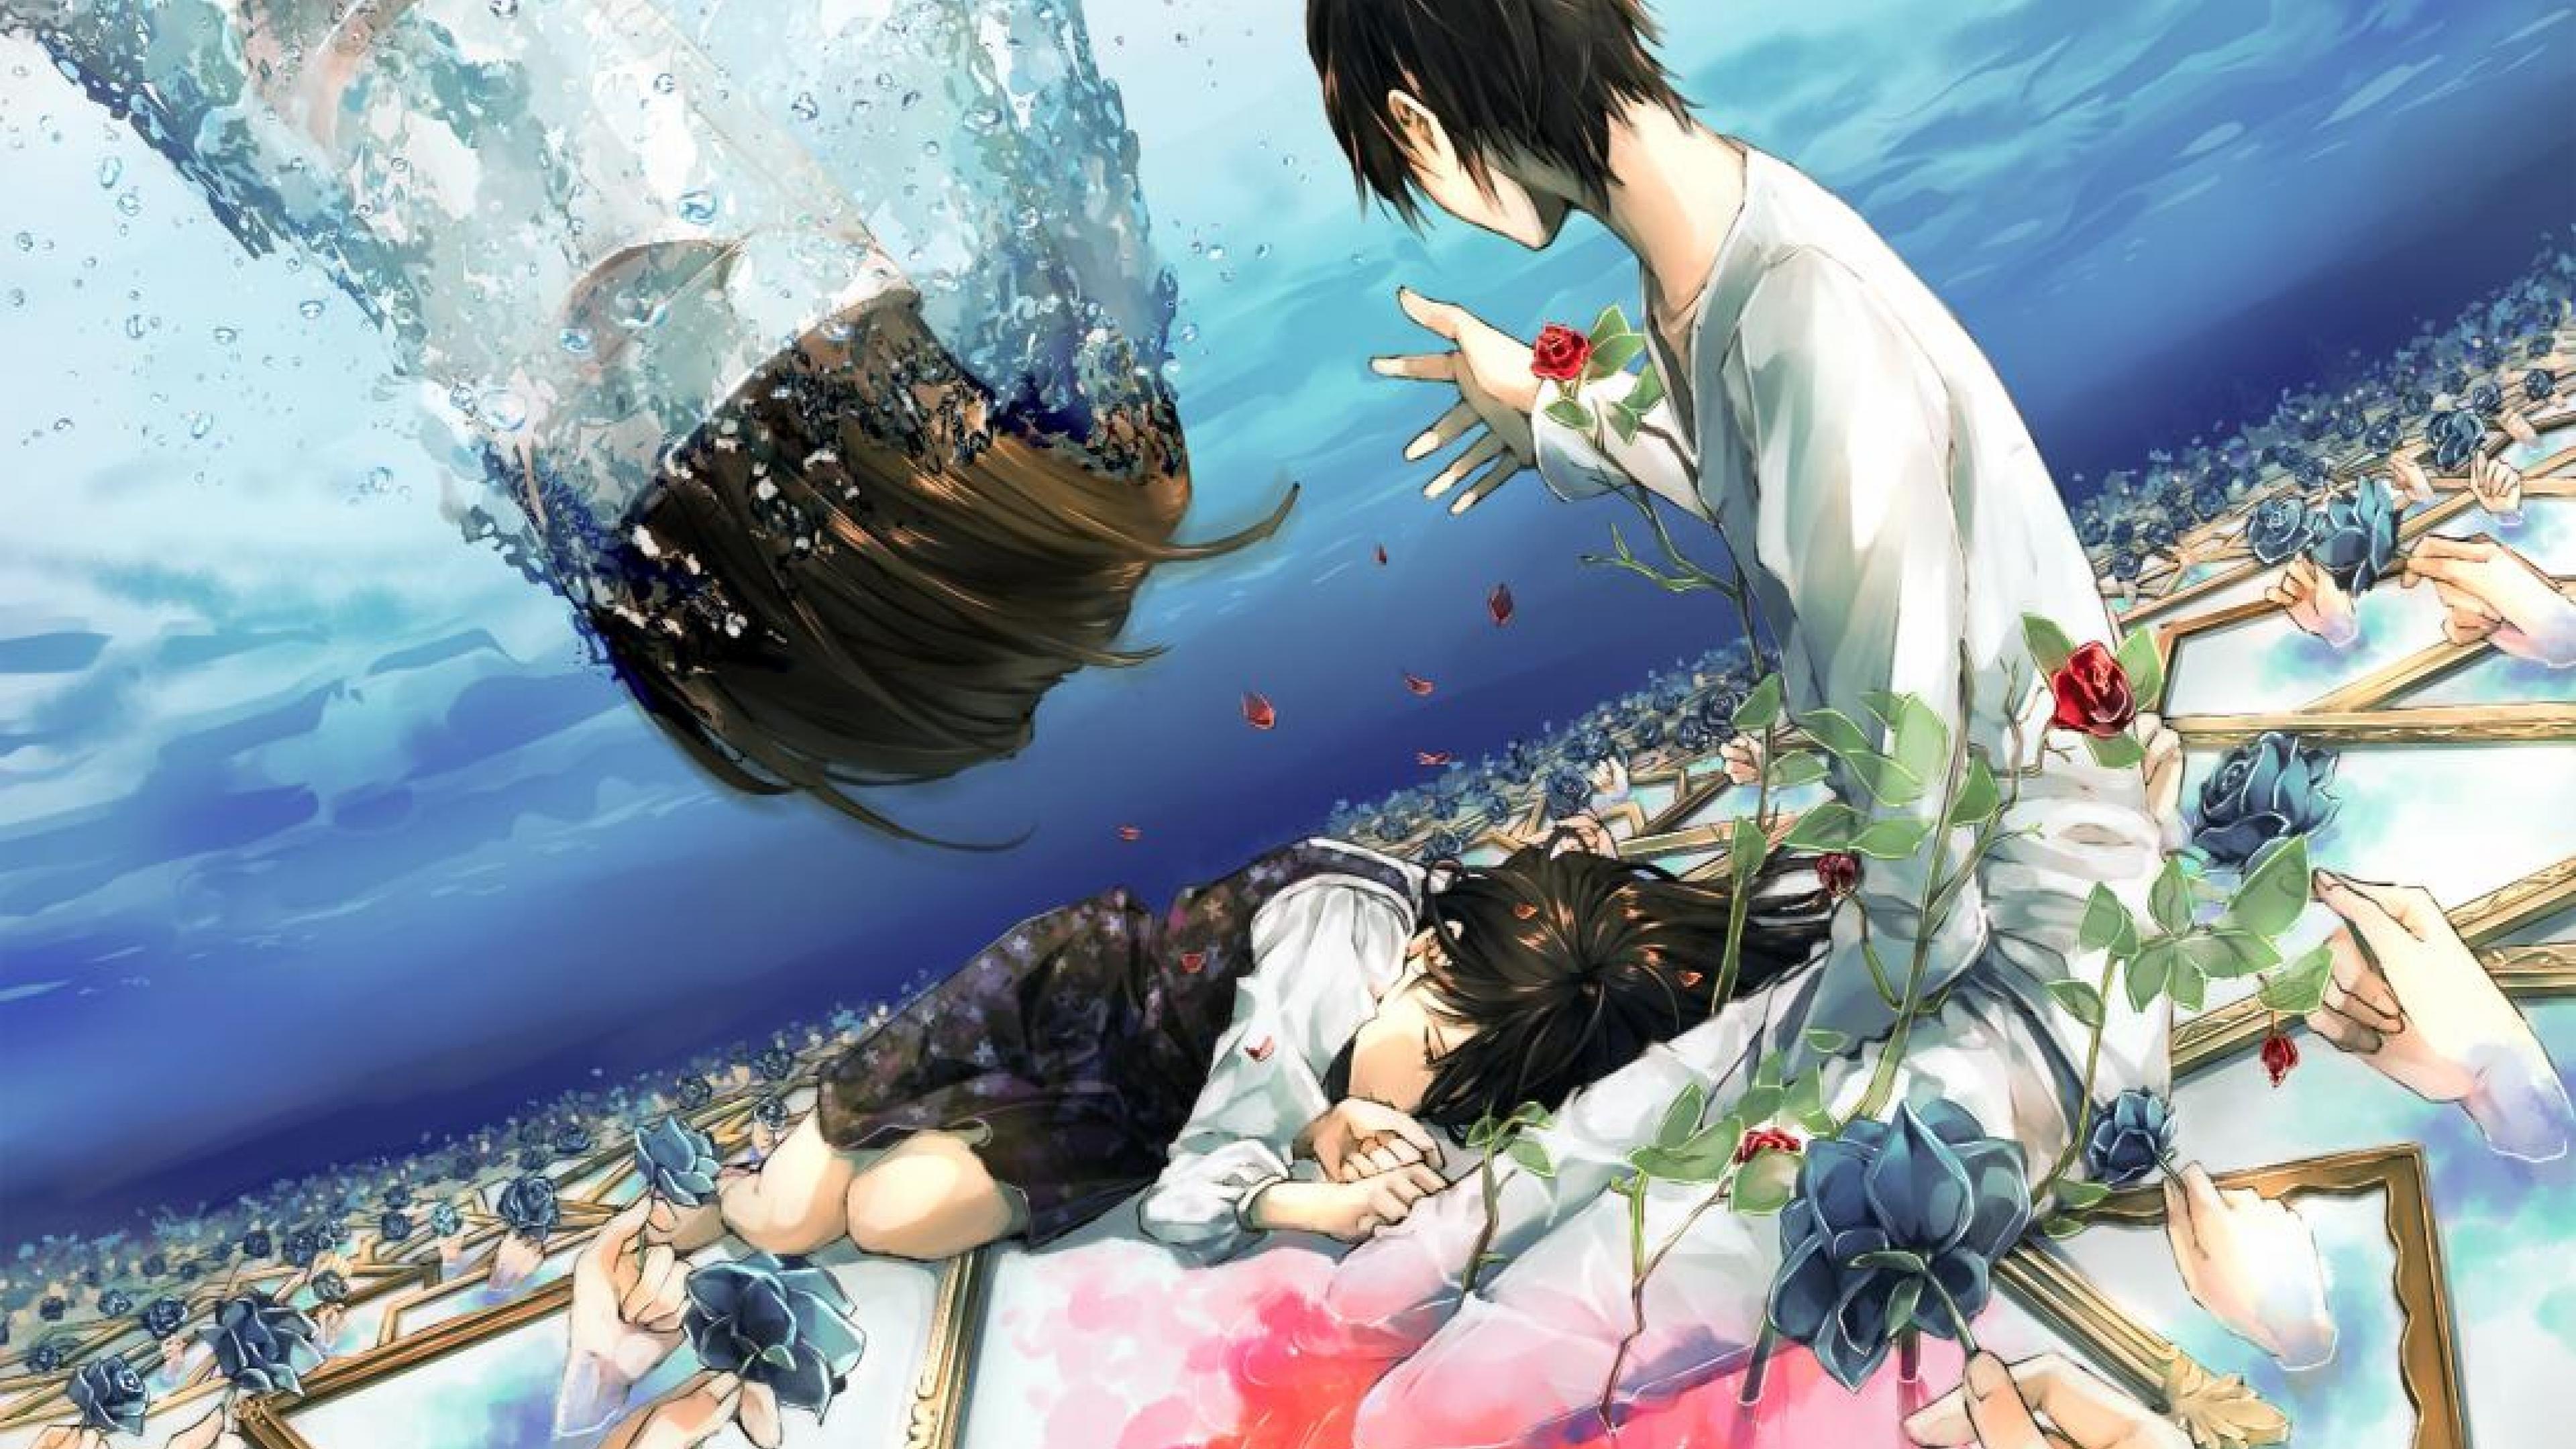 Fantasy art Anime HD Wallpapers, Desktop Backgrounds